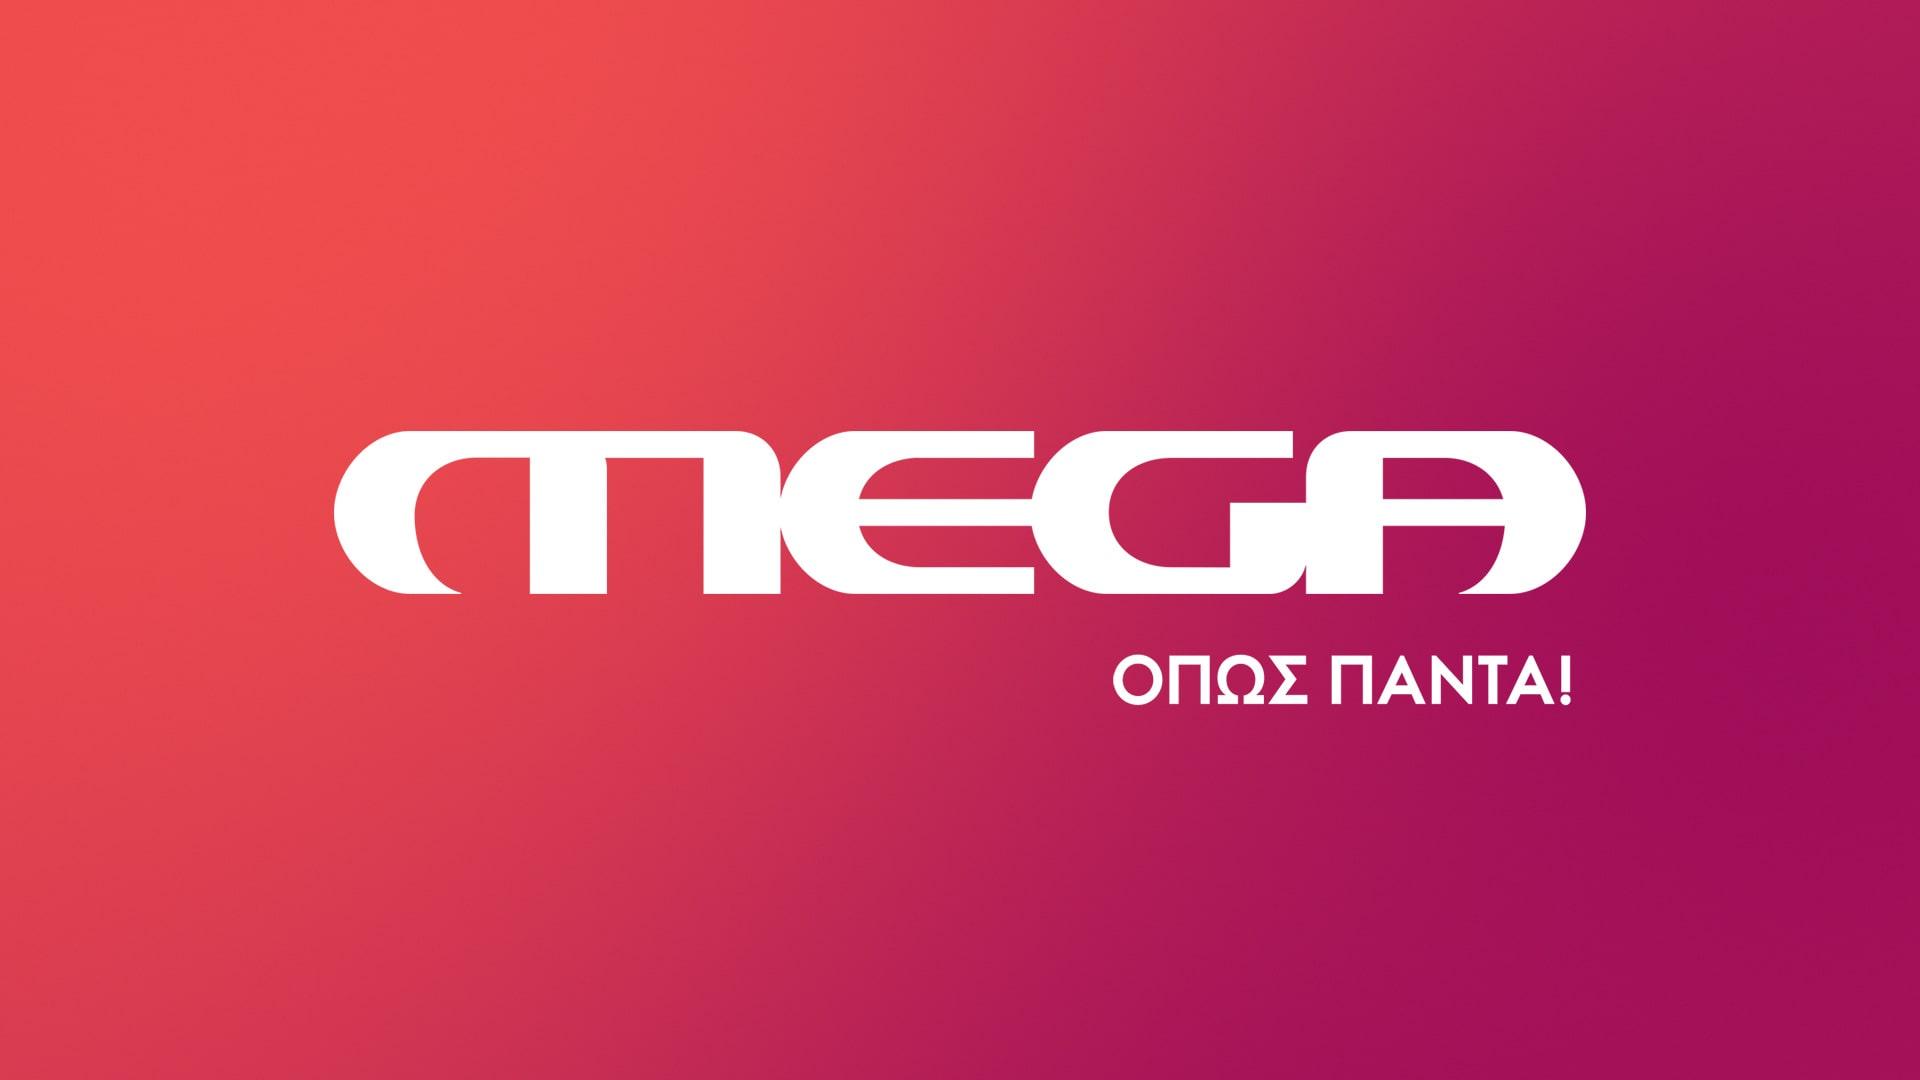 MEGA: Αλλαγή Προγράμματος (11/1-16/1) - Layout